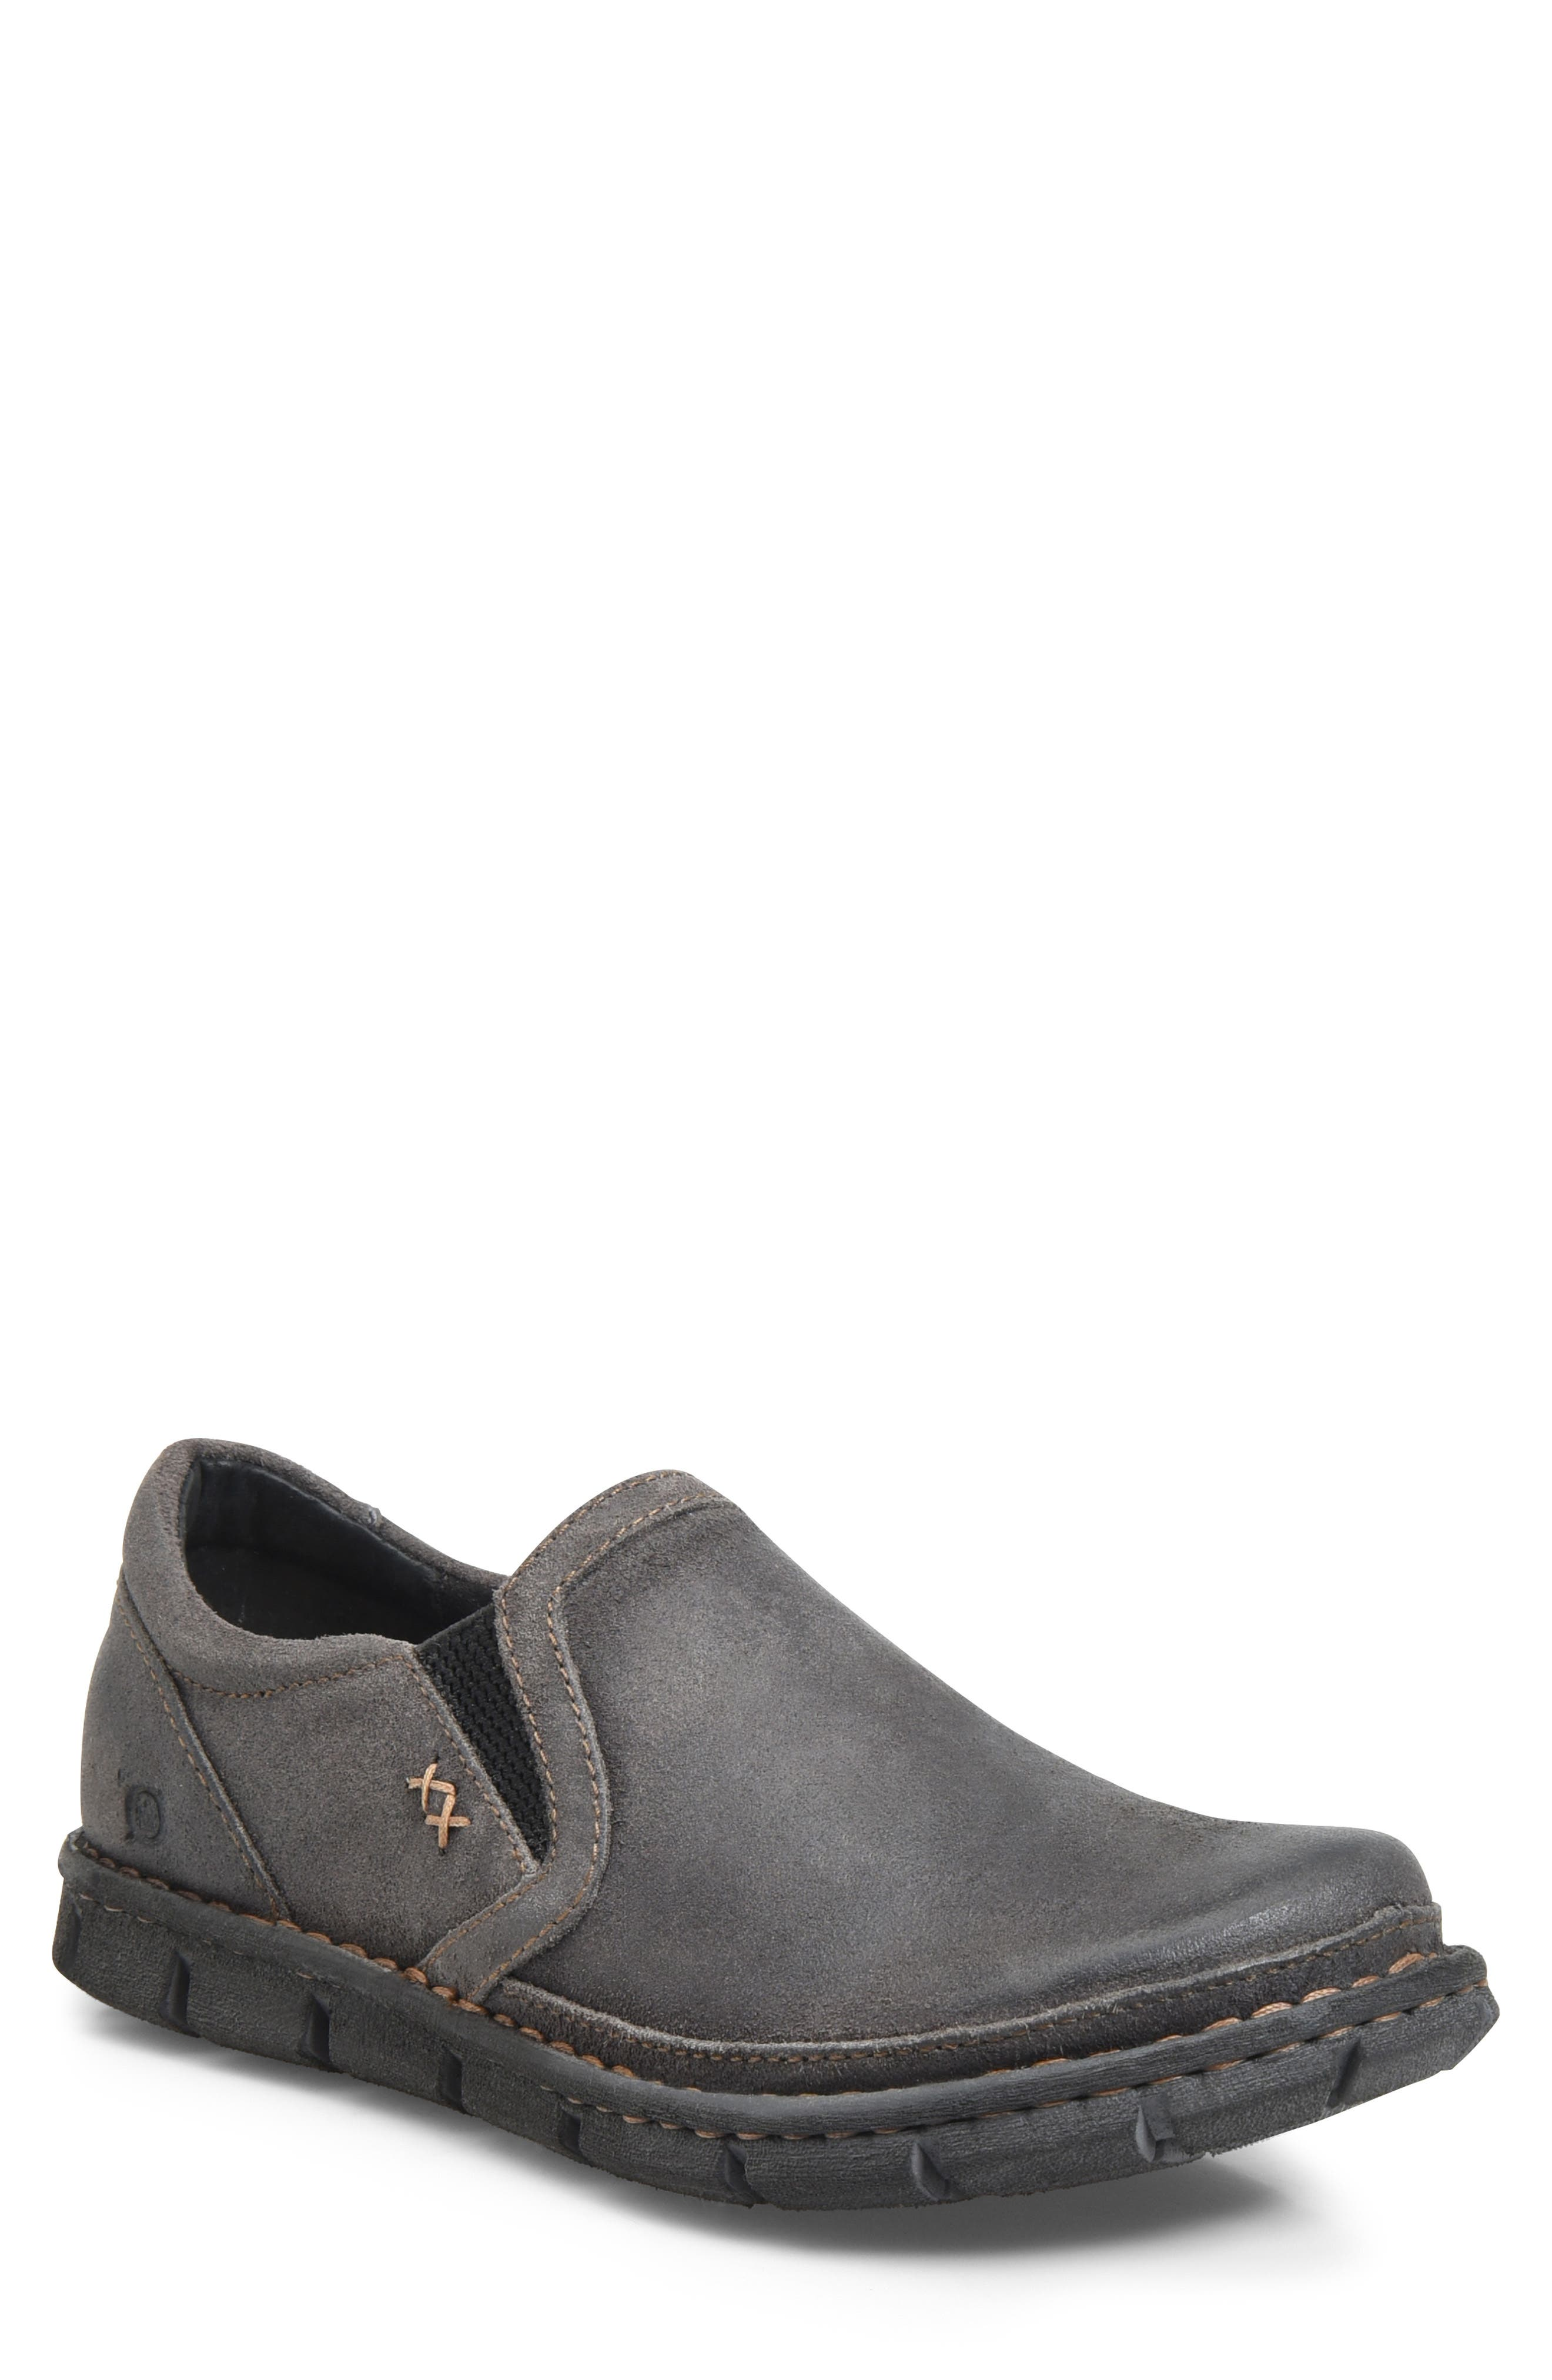 'Sawyer' Leather Slip-On,                         Main,                         color, DARK GREY LEATHER